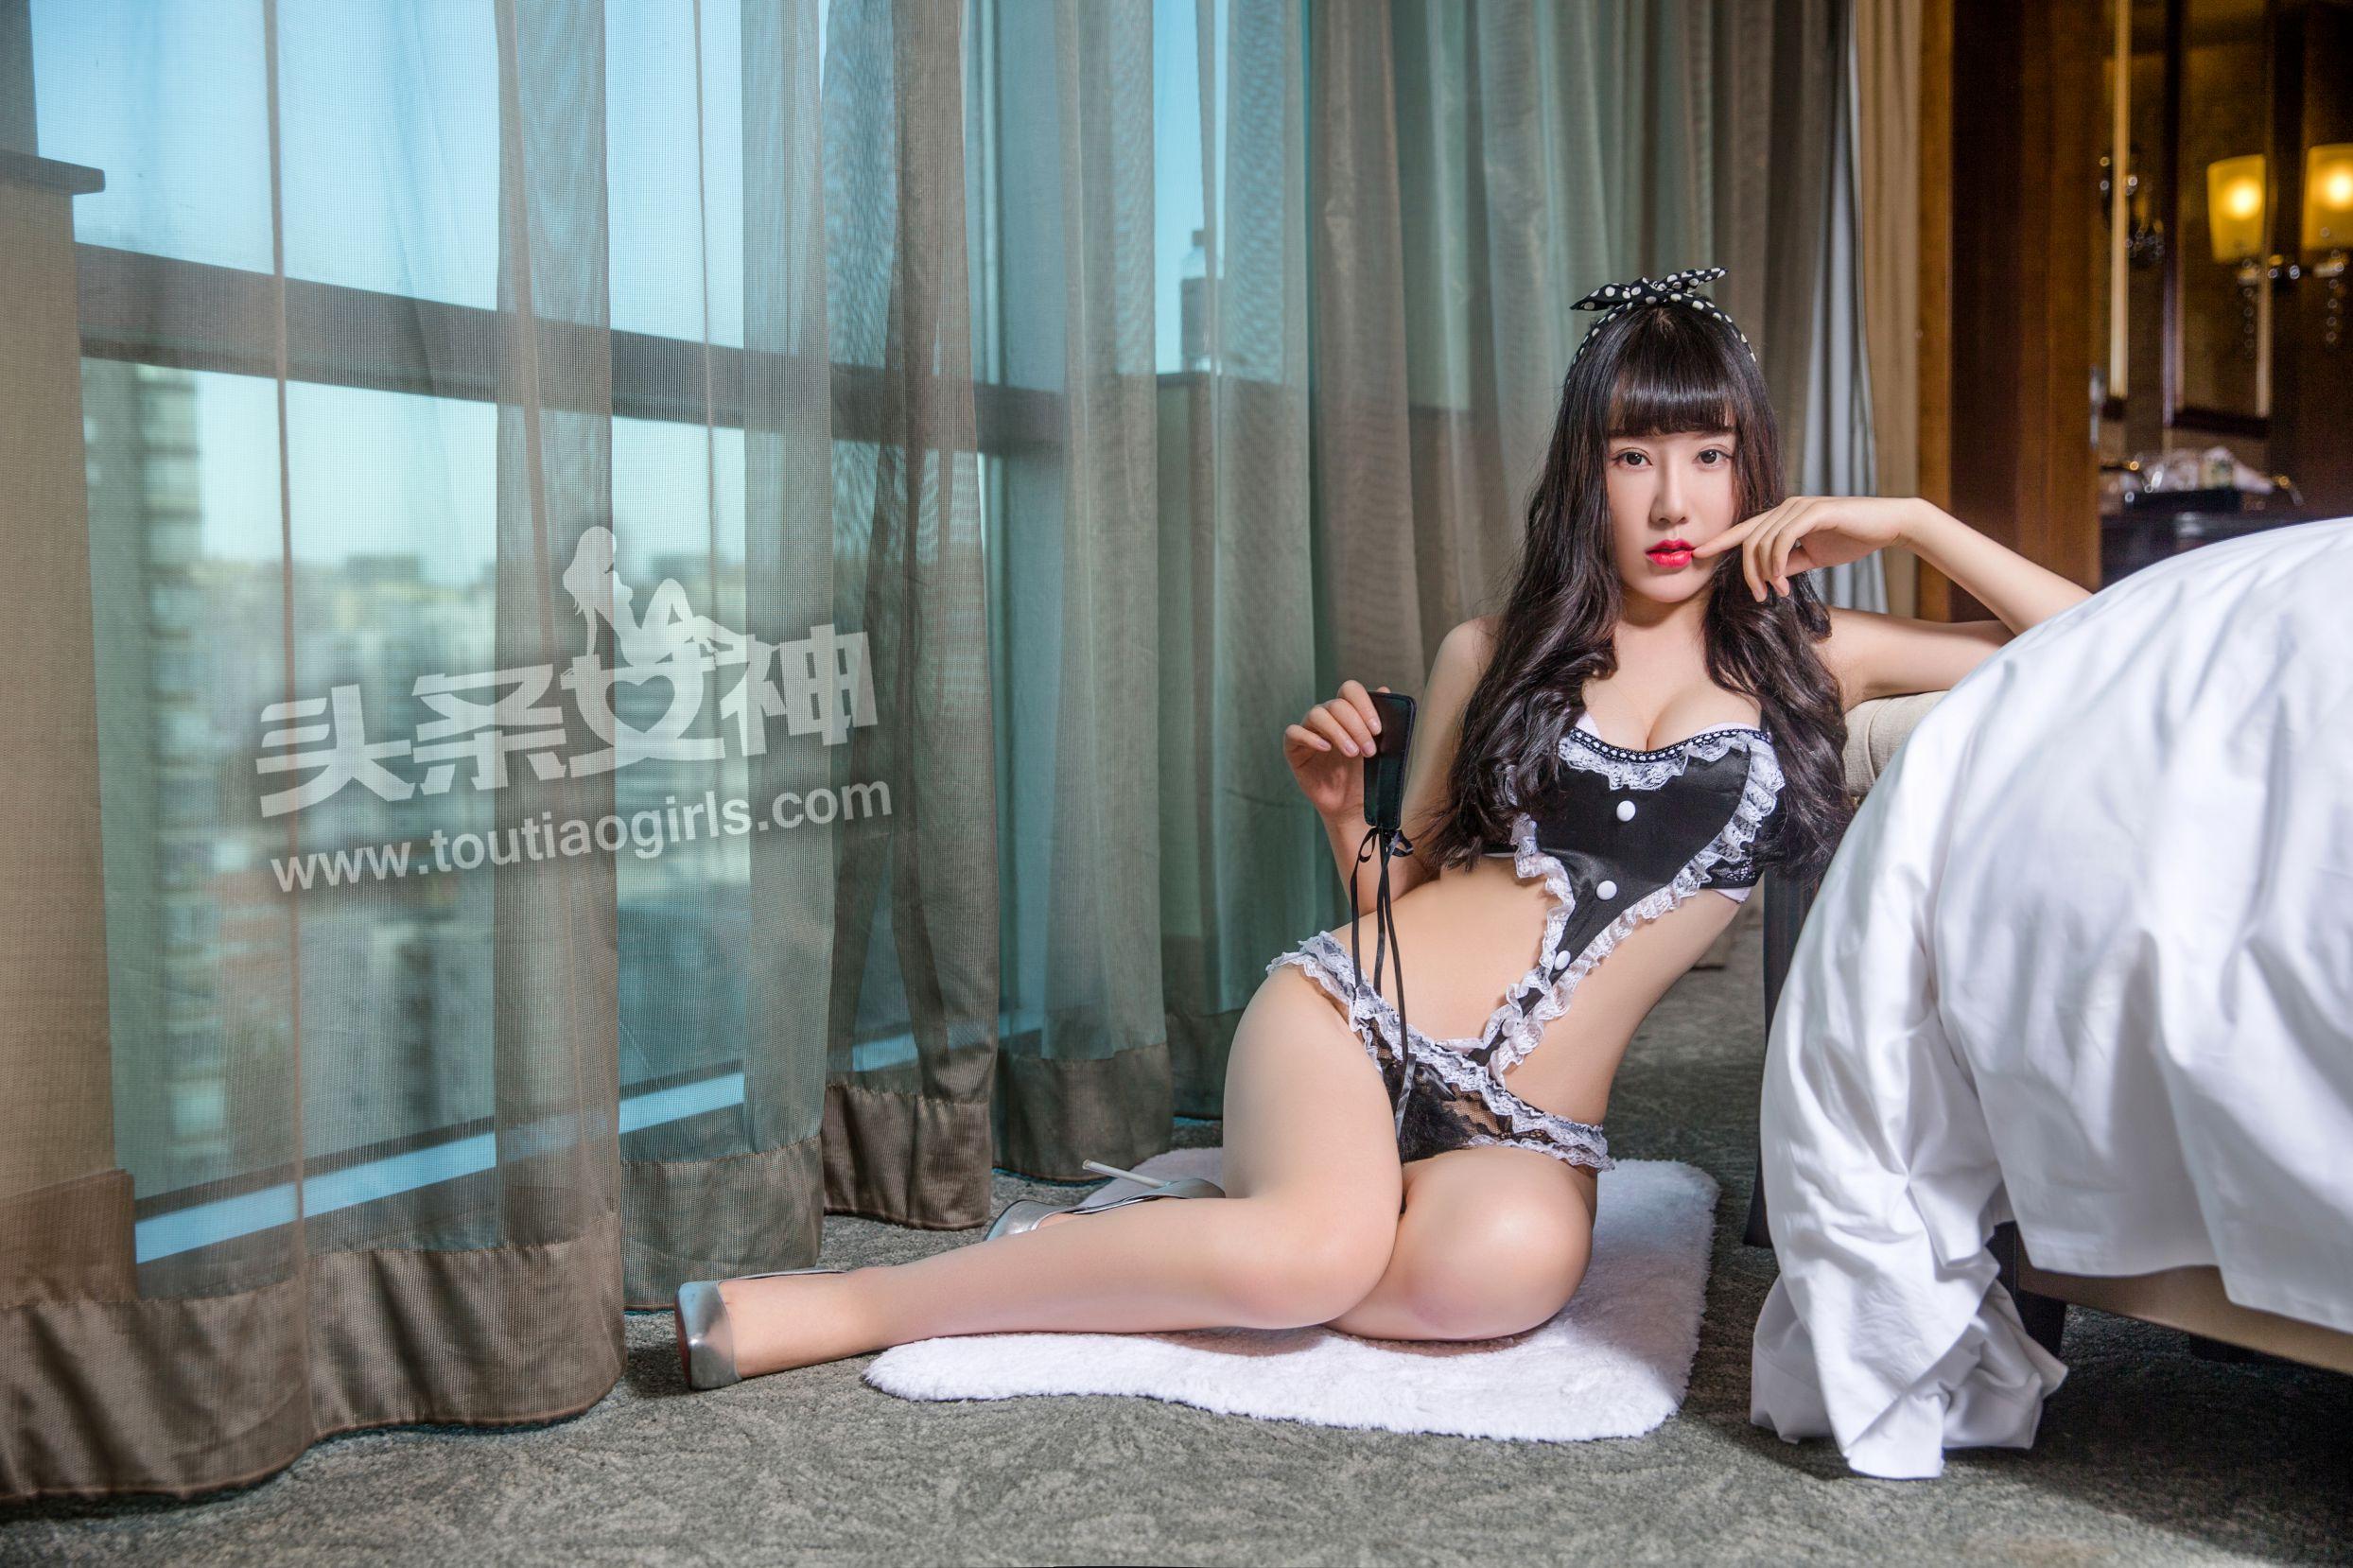 [TouTiao头条女神] VIP专辑 夏笑笑 - 女佣大征服  [37P]